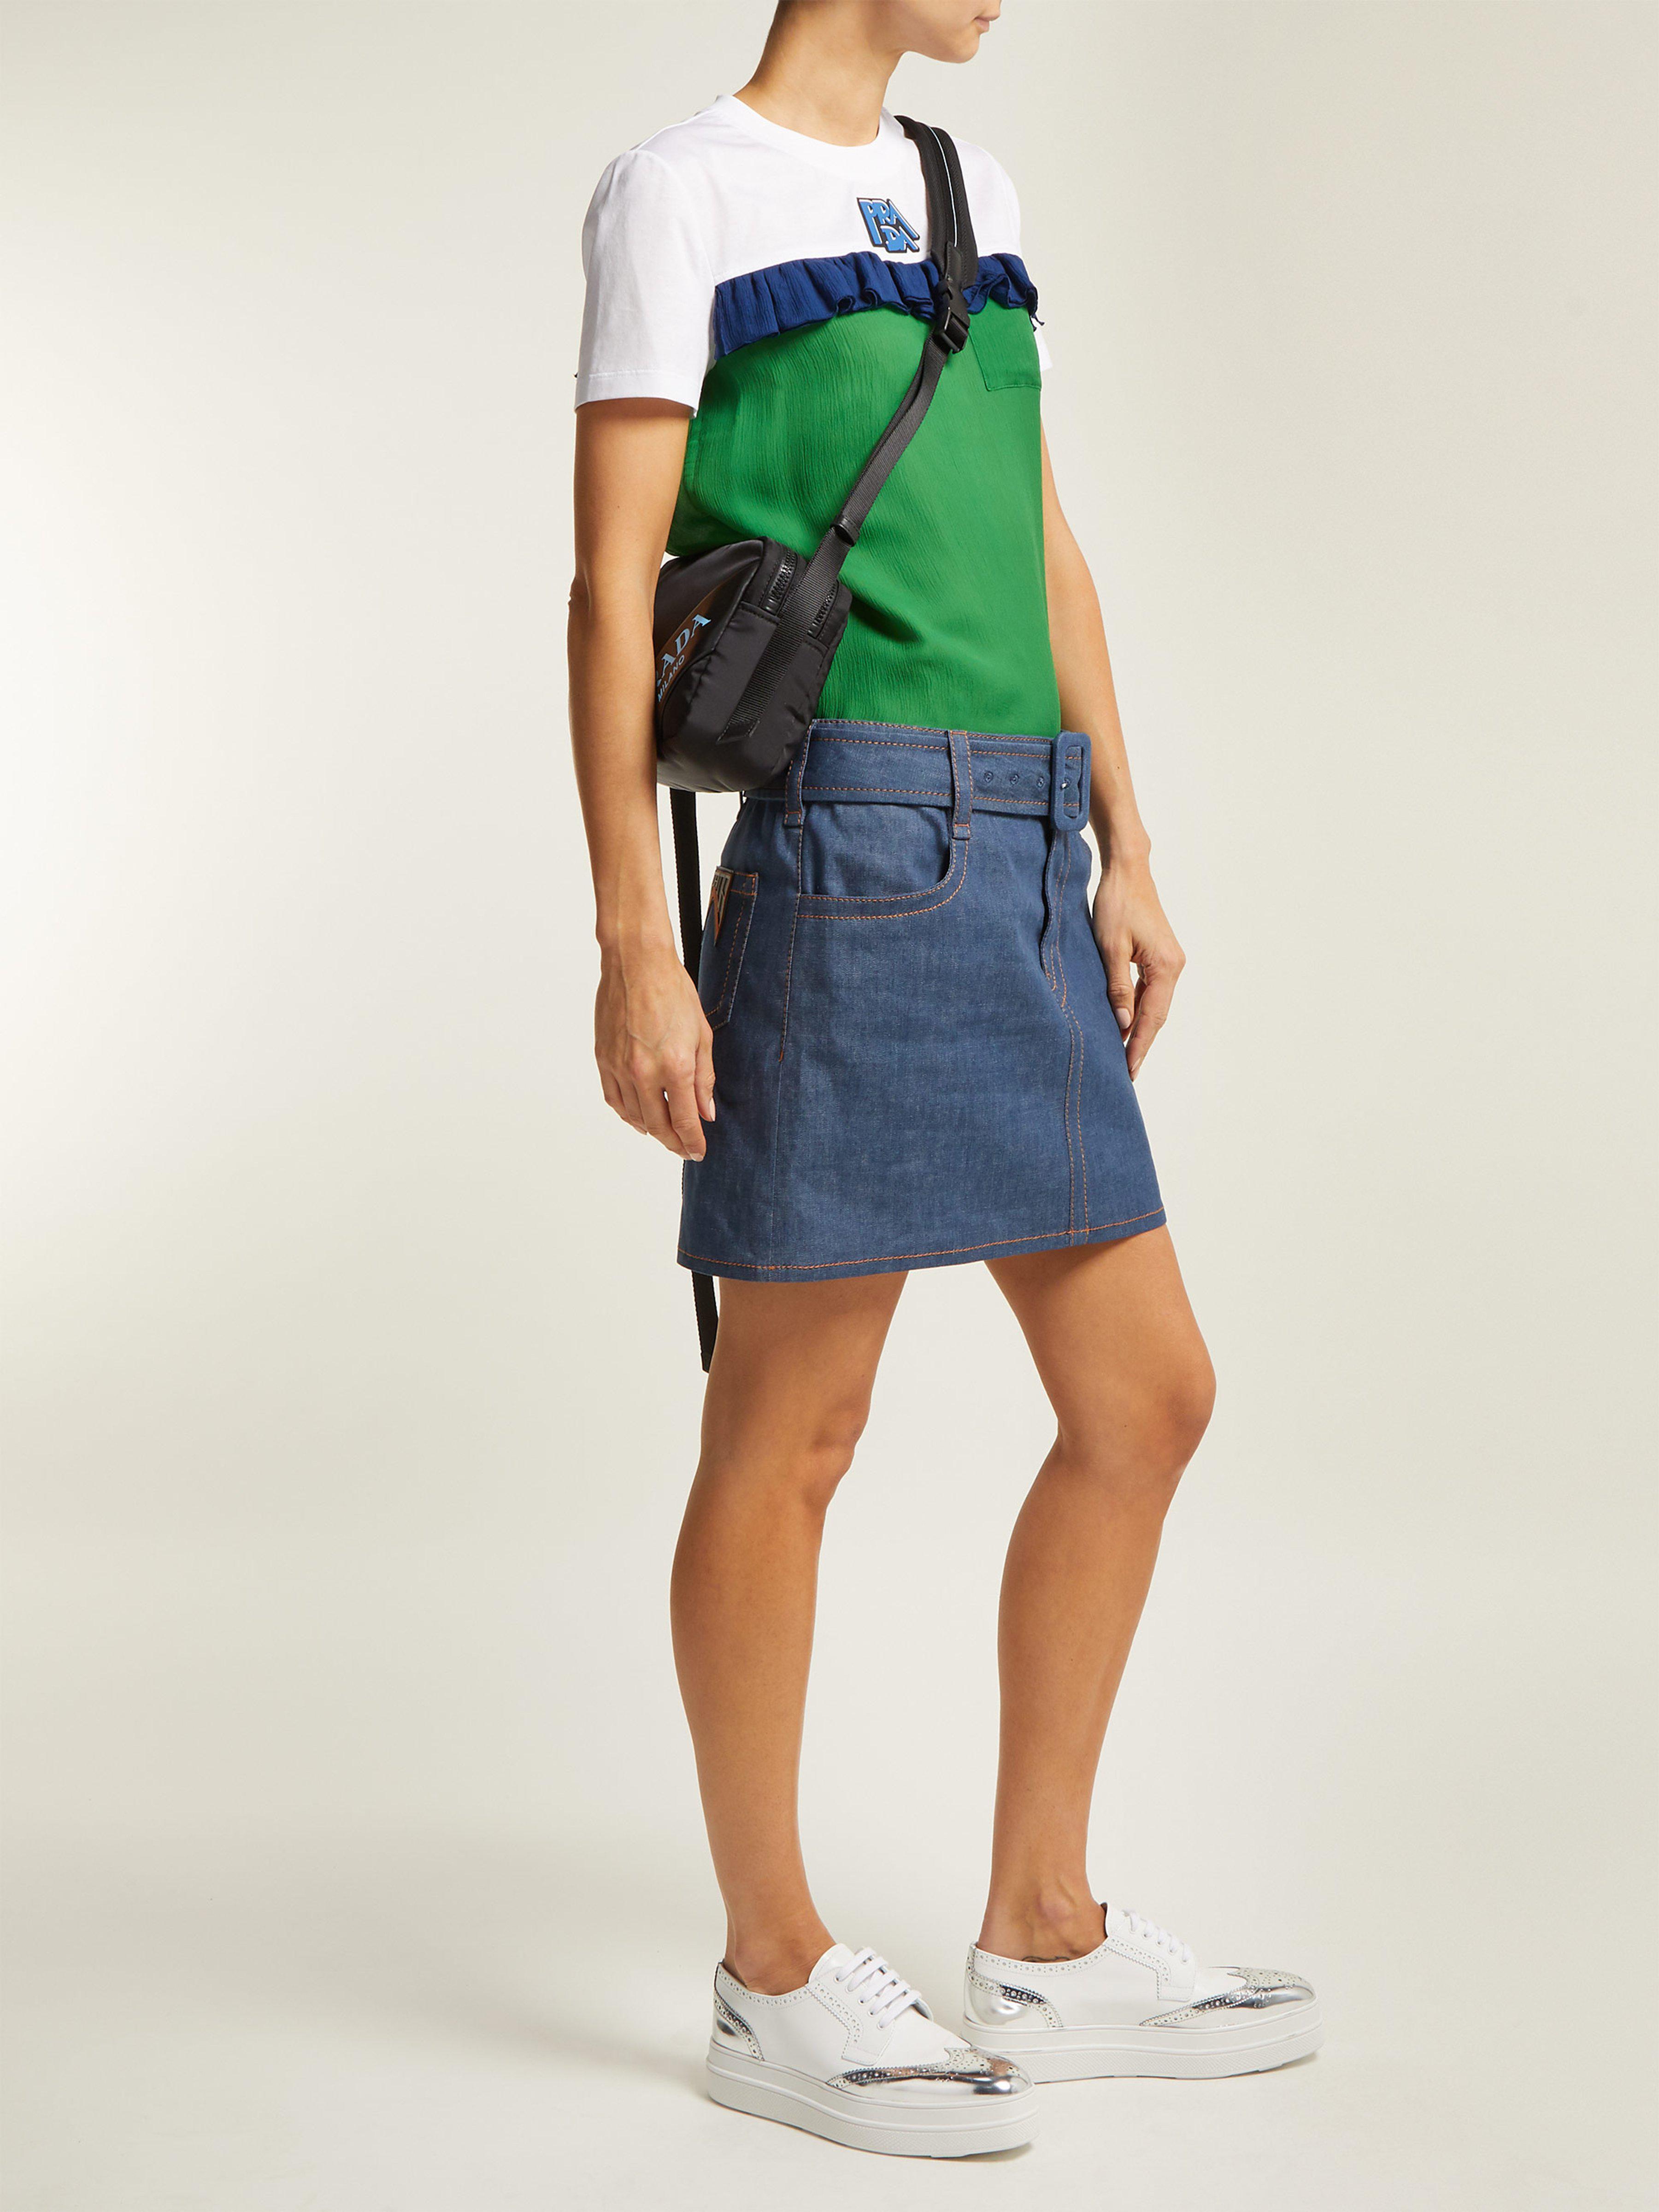 0801da2f1b1a8 Prada Ruffle Trimmed Cotton And Chiffon T Shirt in Green - Lyst